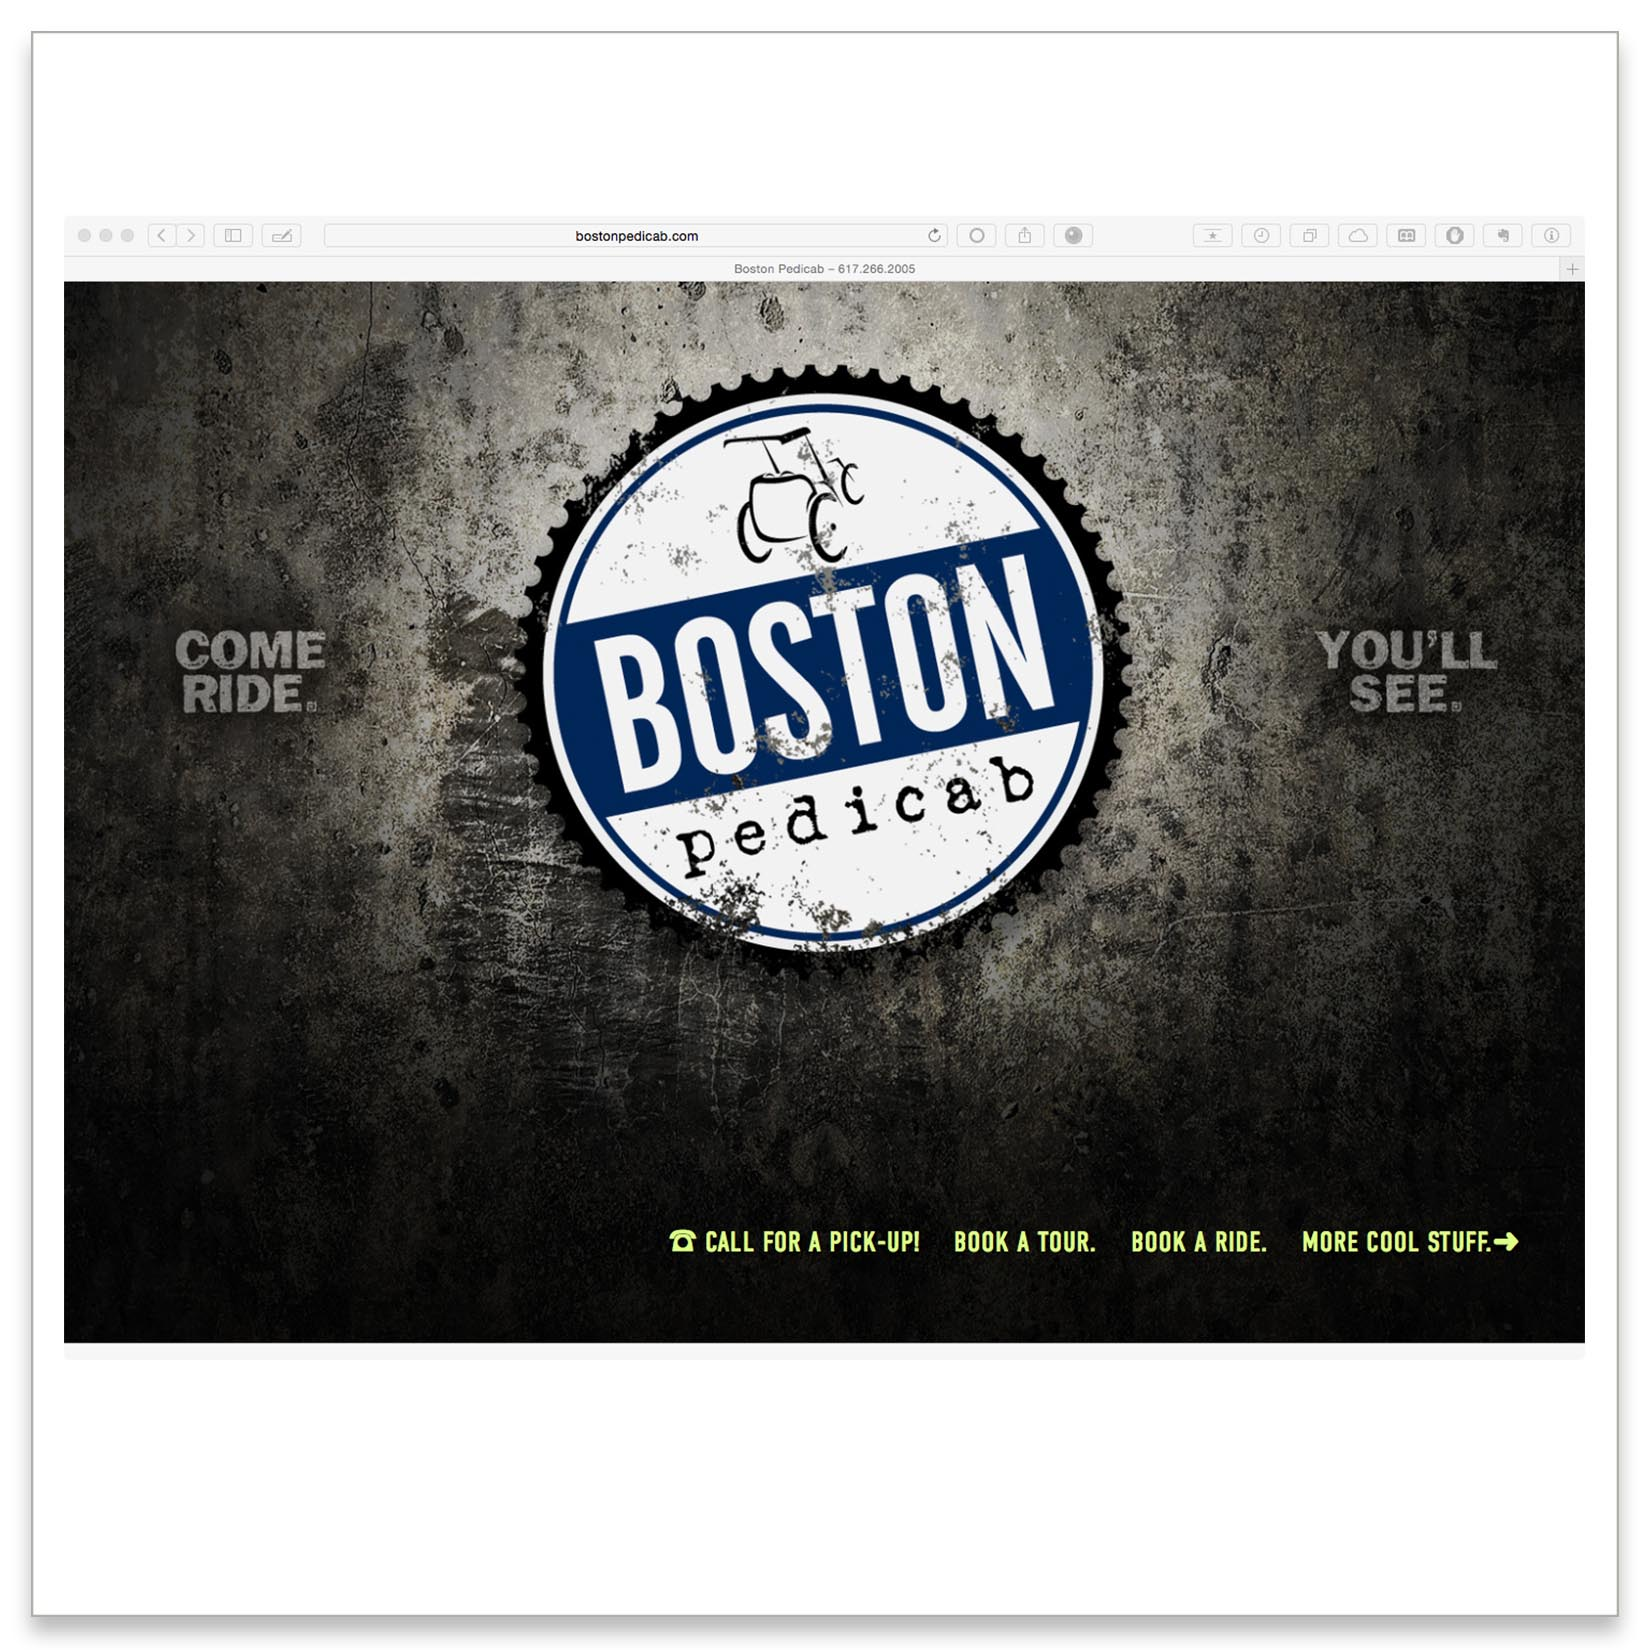 WorkSamples_Pedicab Boston.jpg